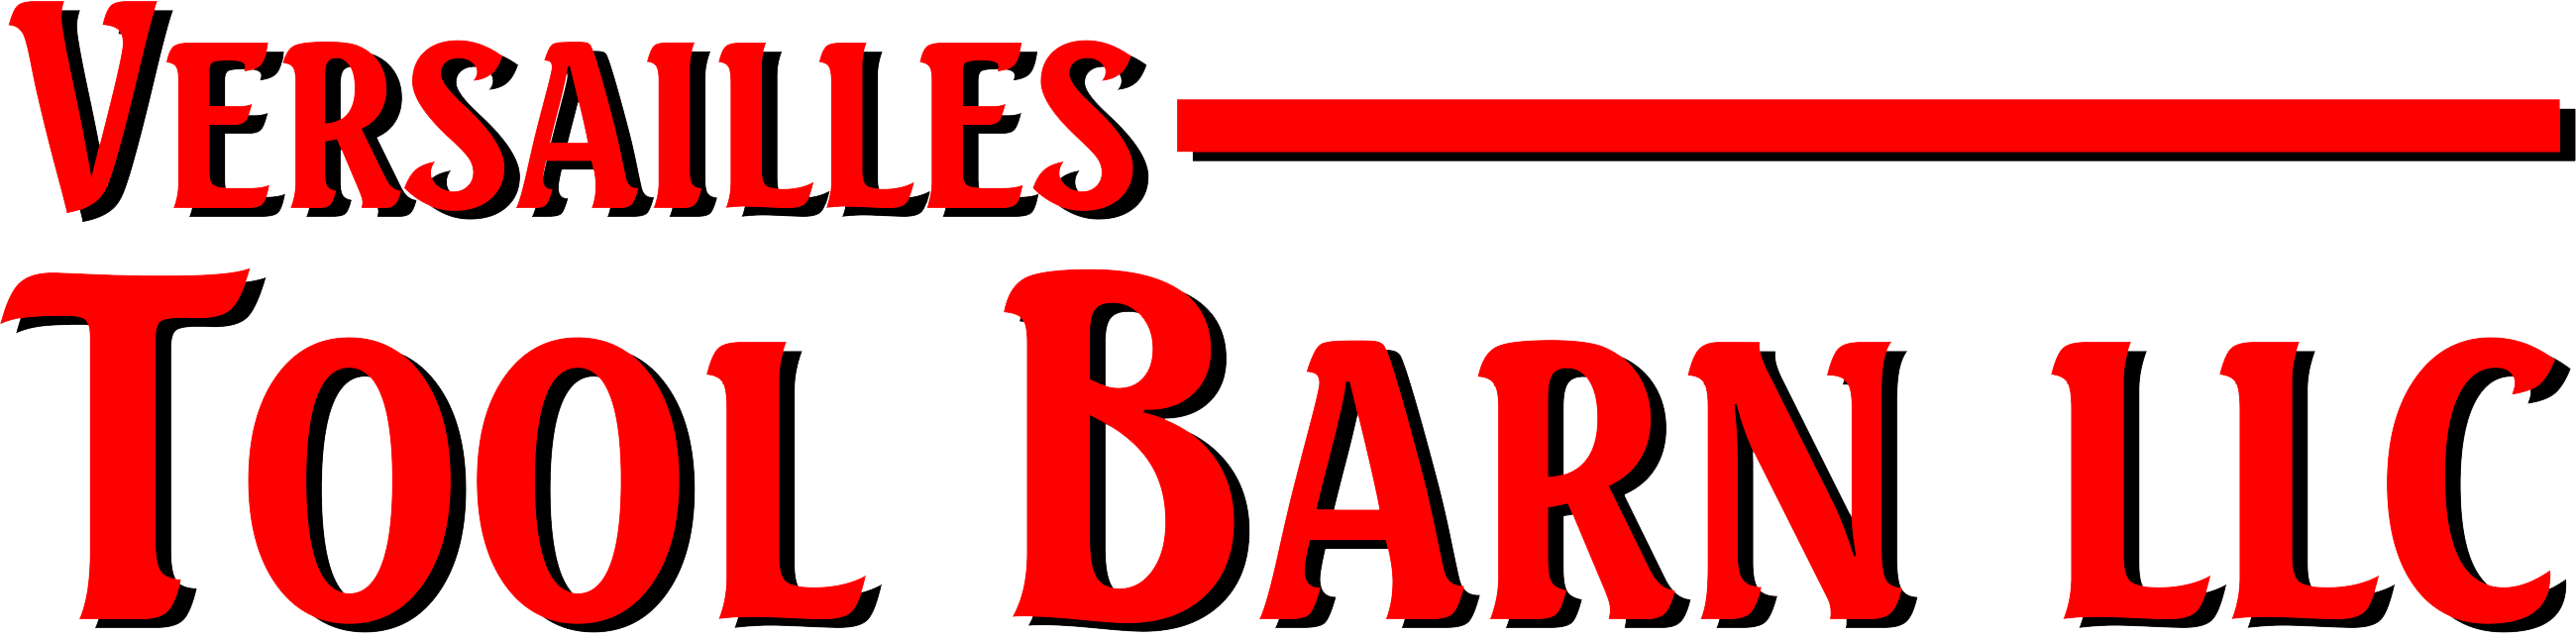 Versailles Tool Barn